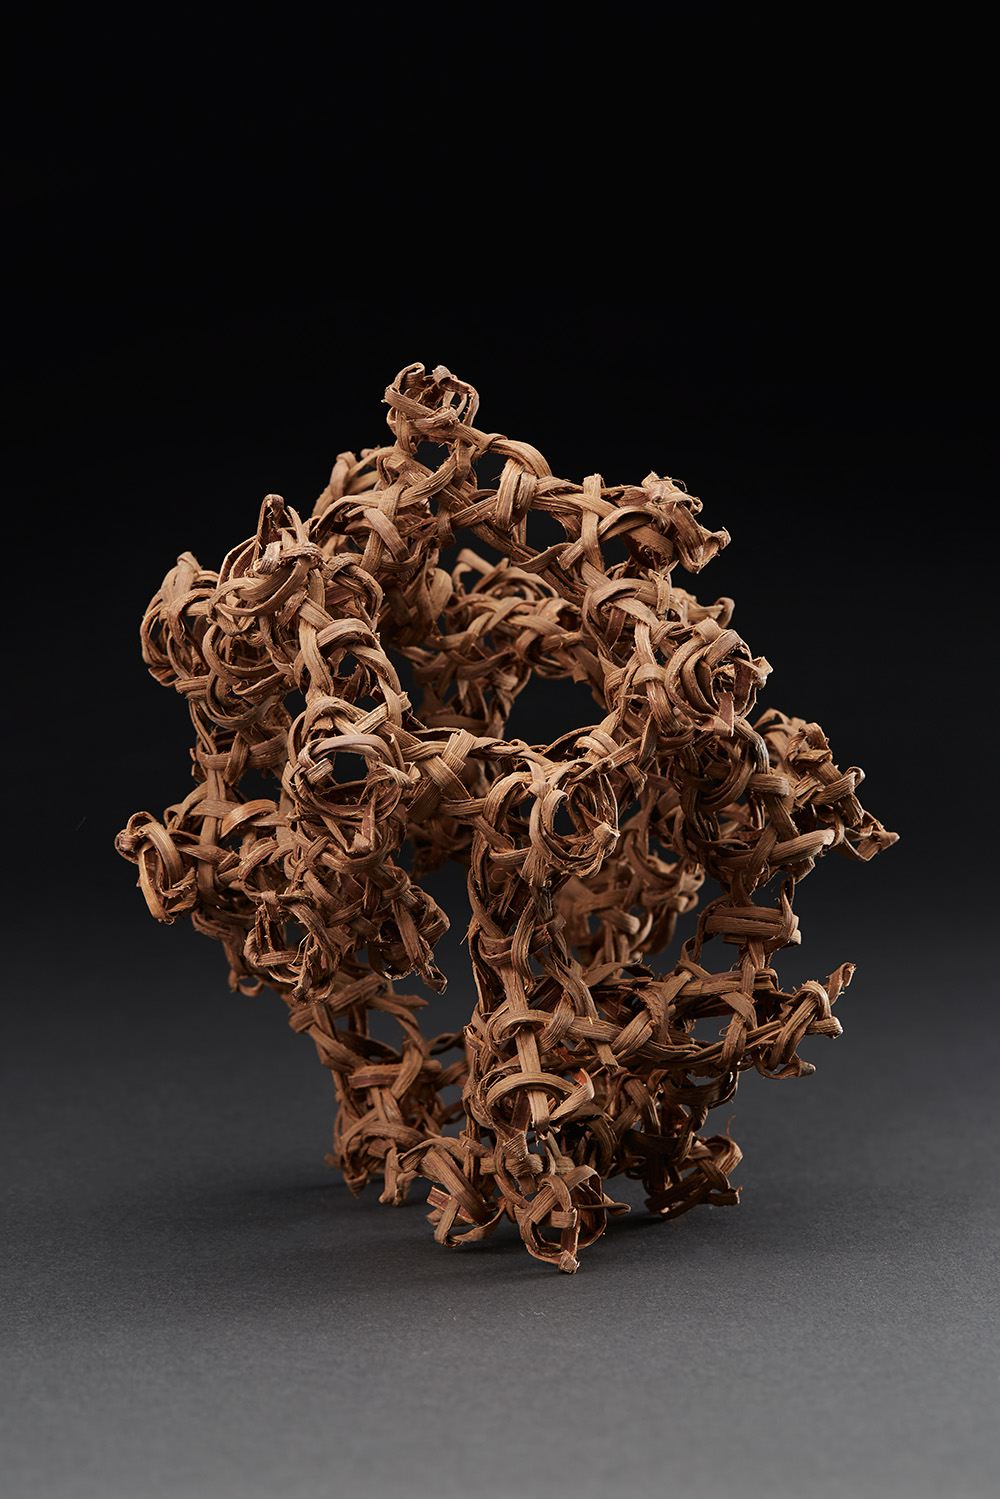 Ritsuko Jinnouchi  TETRA 5 (Four Direction Structure 5)  , 2013 Plaited Vitis Coignetia (Grape vine) 7.09 x 6.1 x 7.48 inches 18 x 15.5 x 19 cm RJi 7